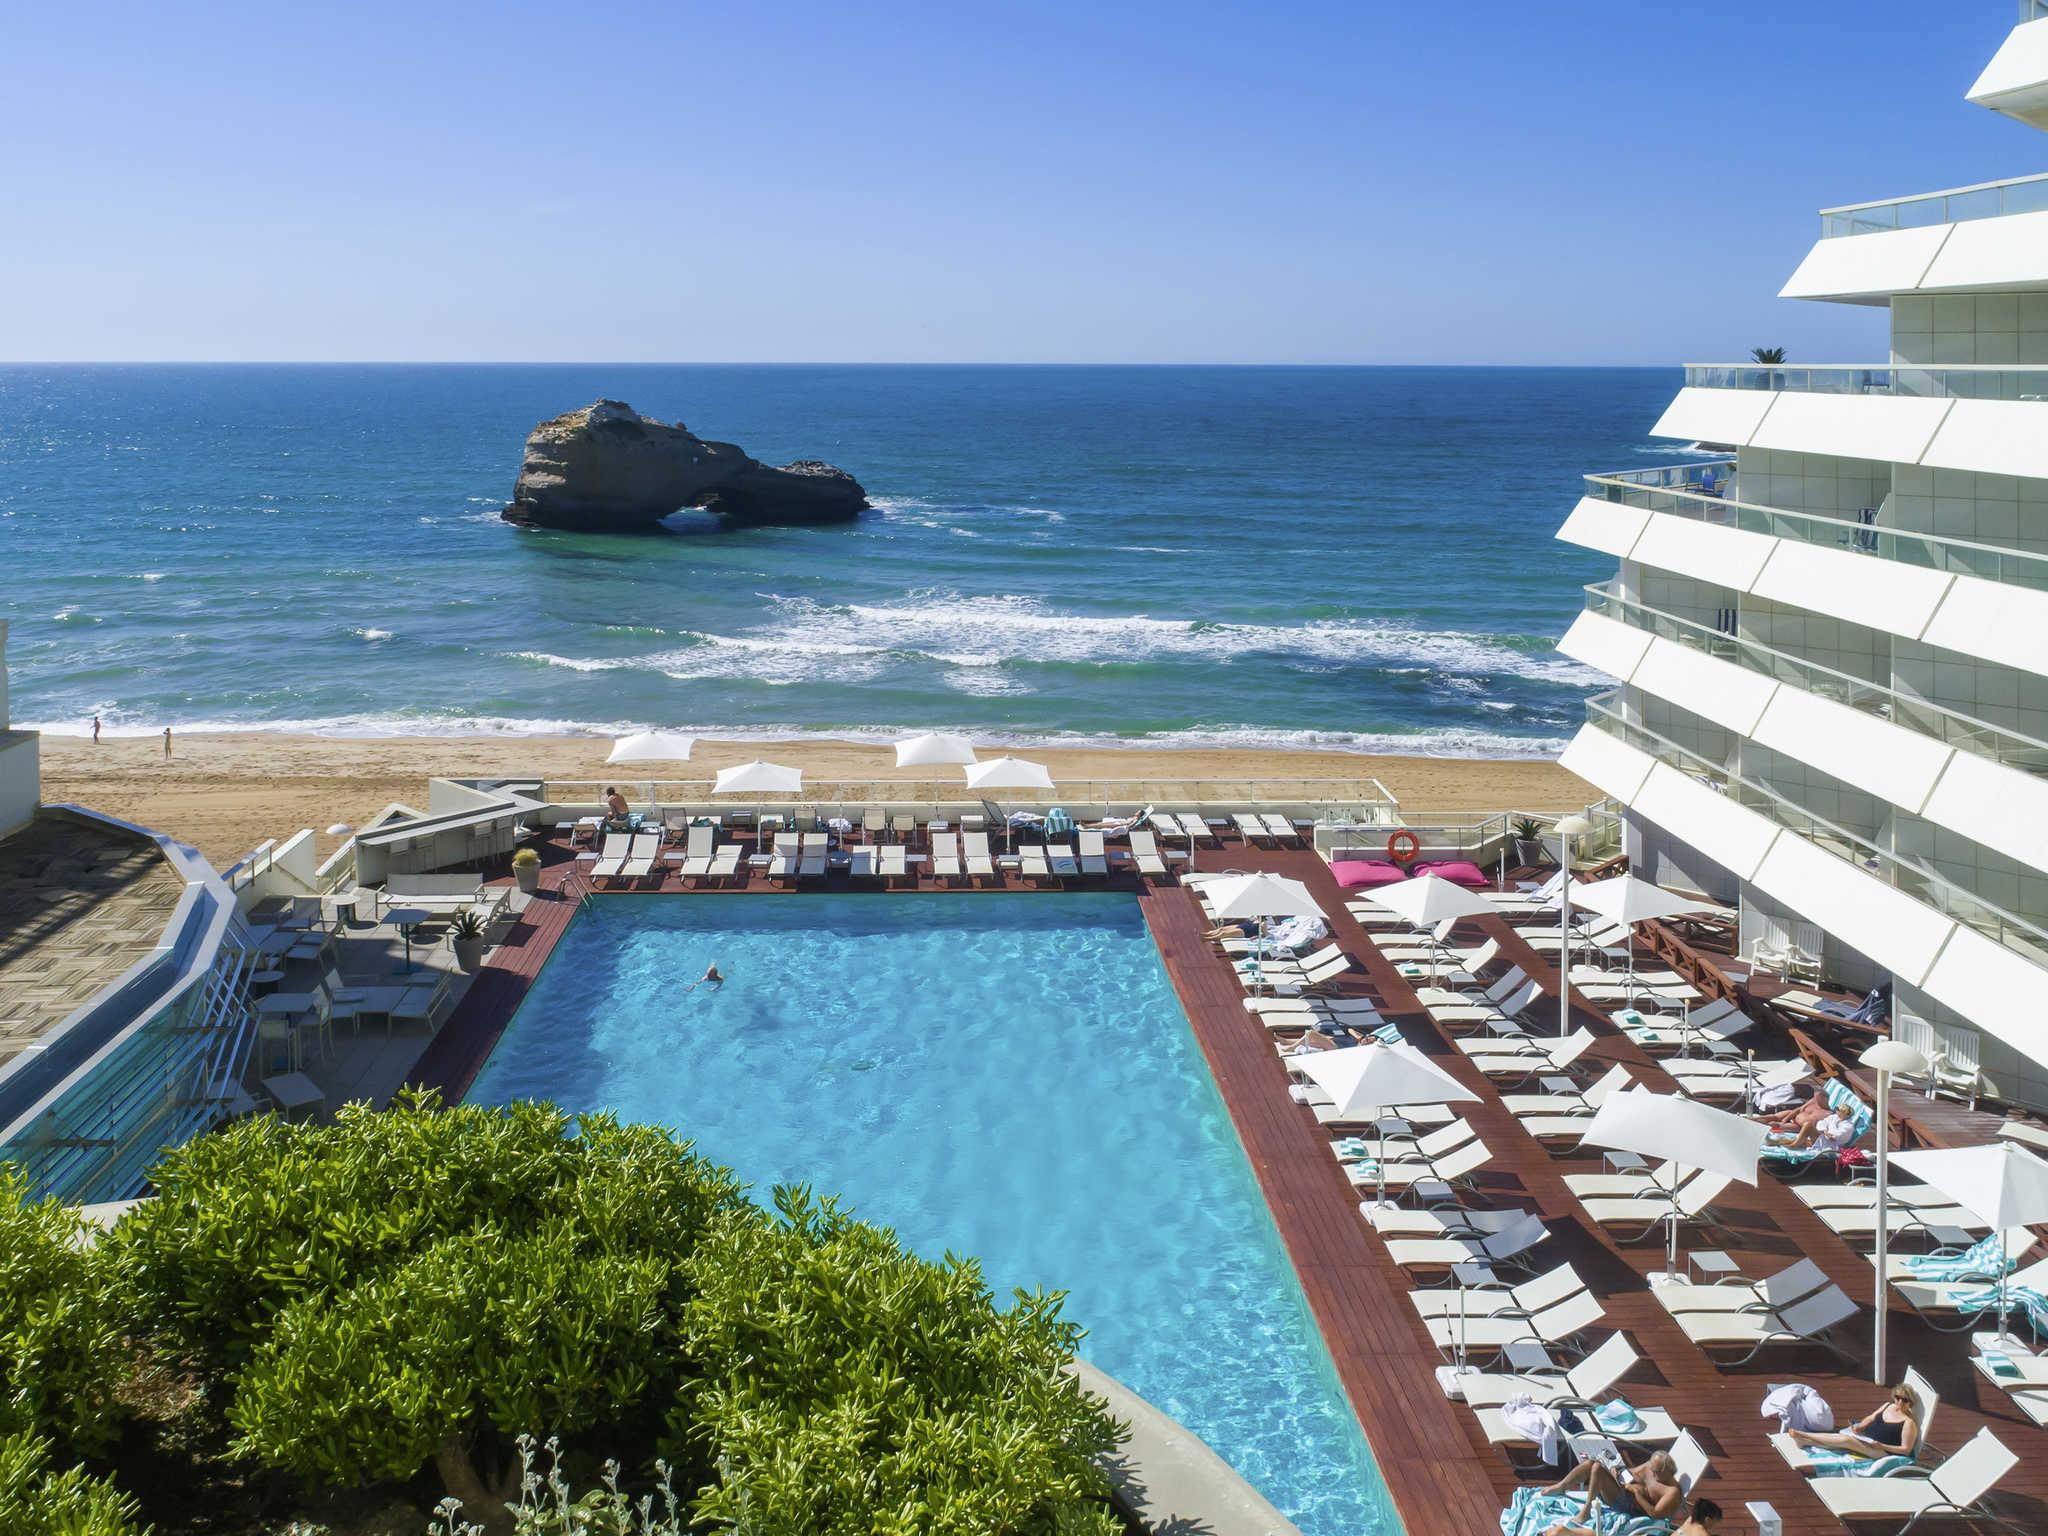 Hôtel - Sofitel Biarritz le Miramar Thalassa sea & spa